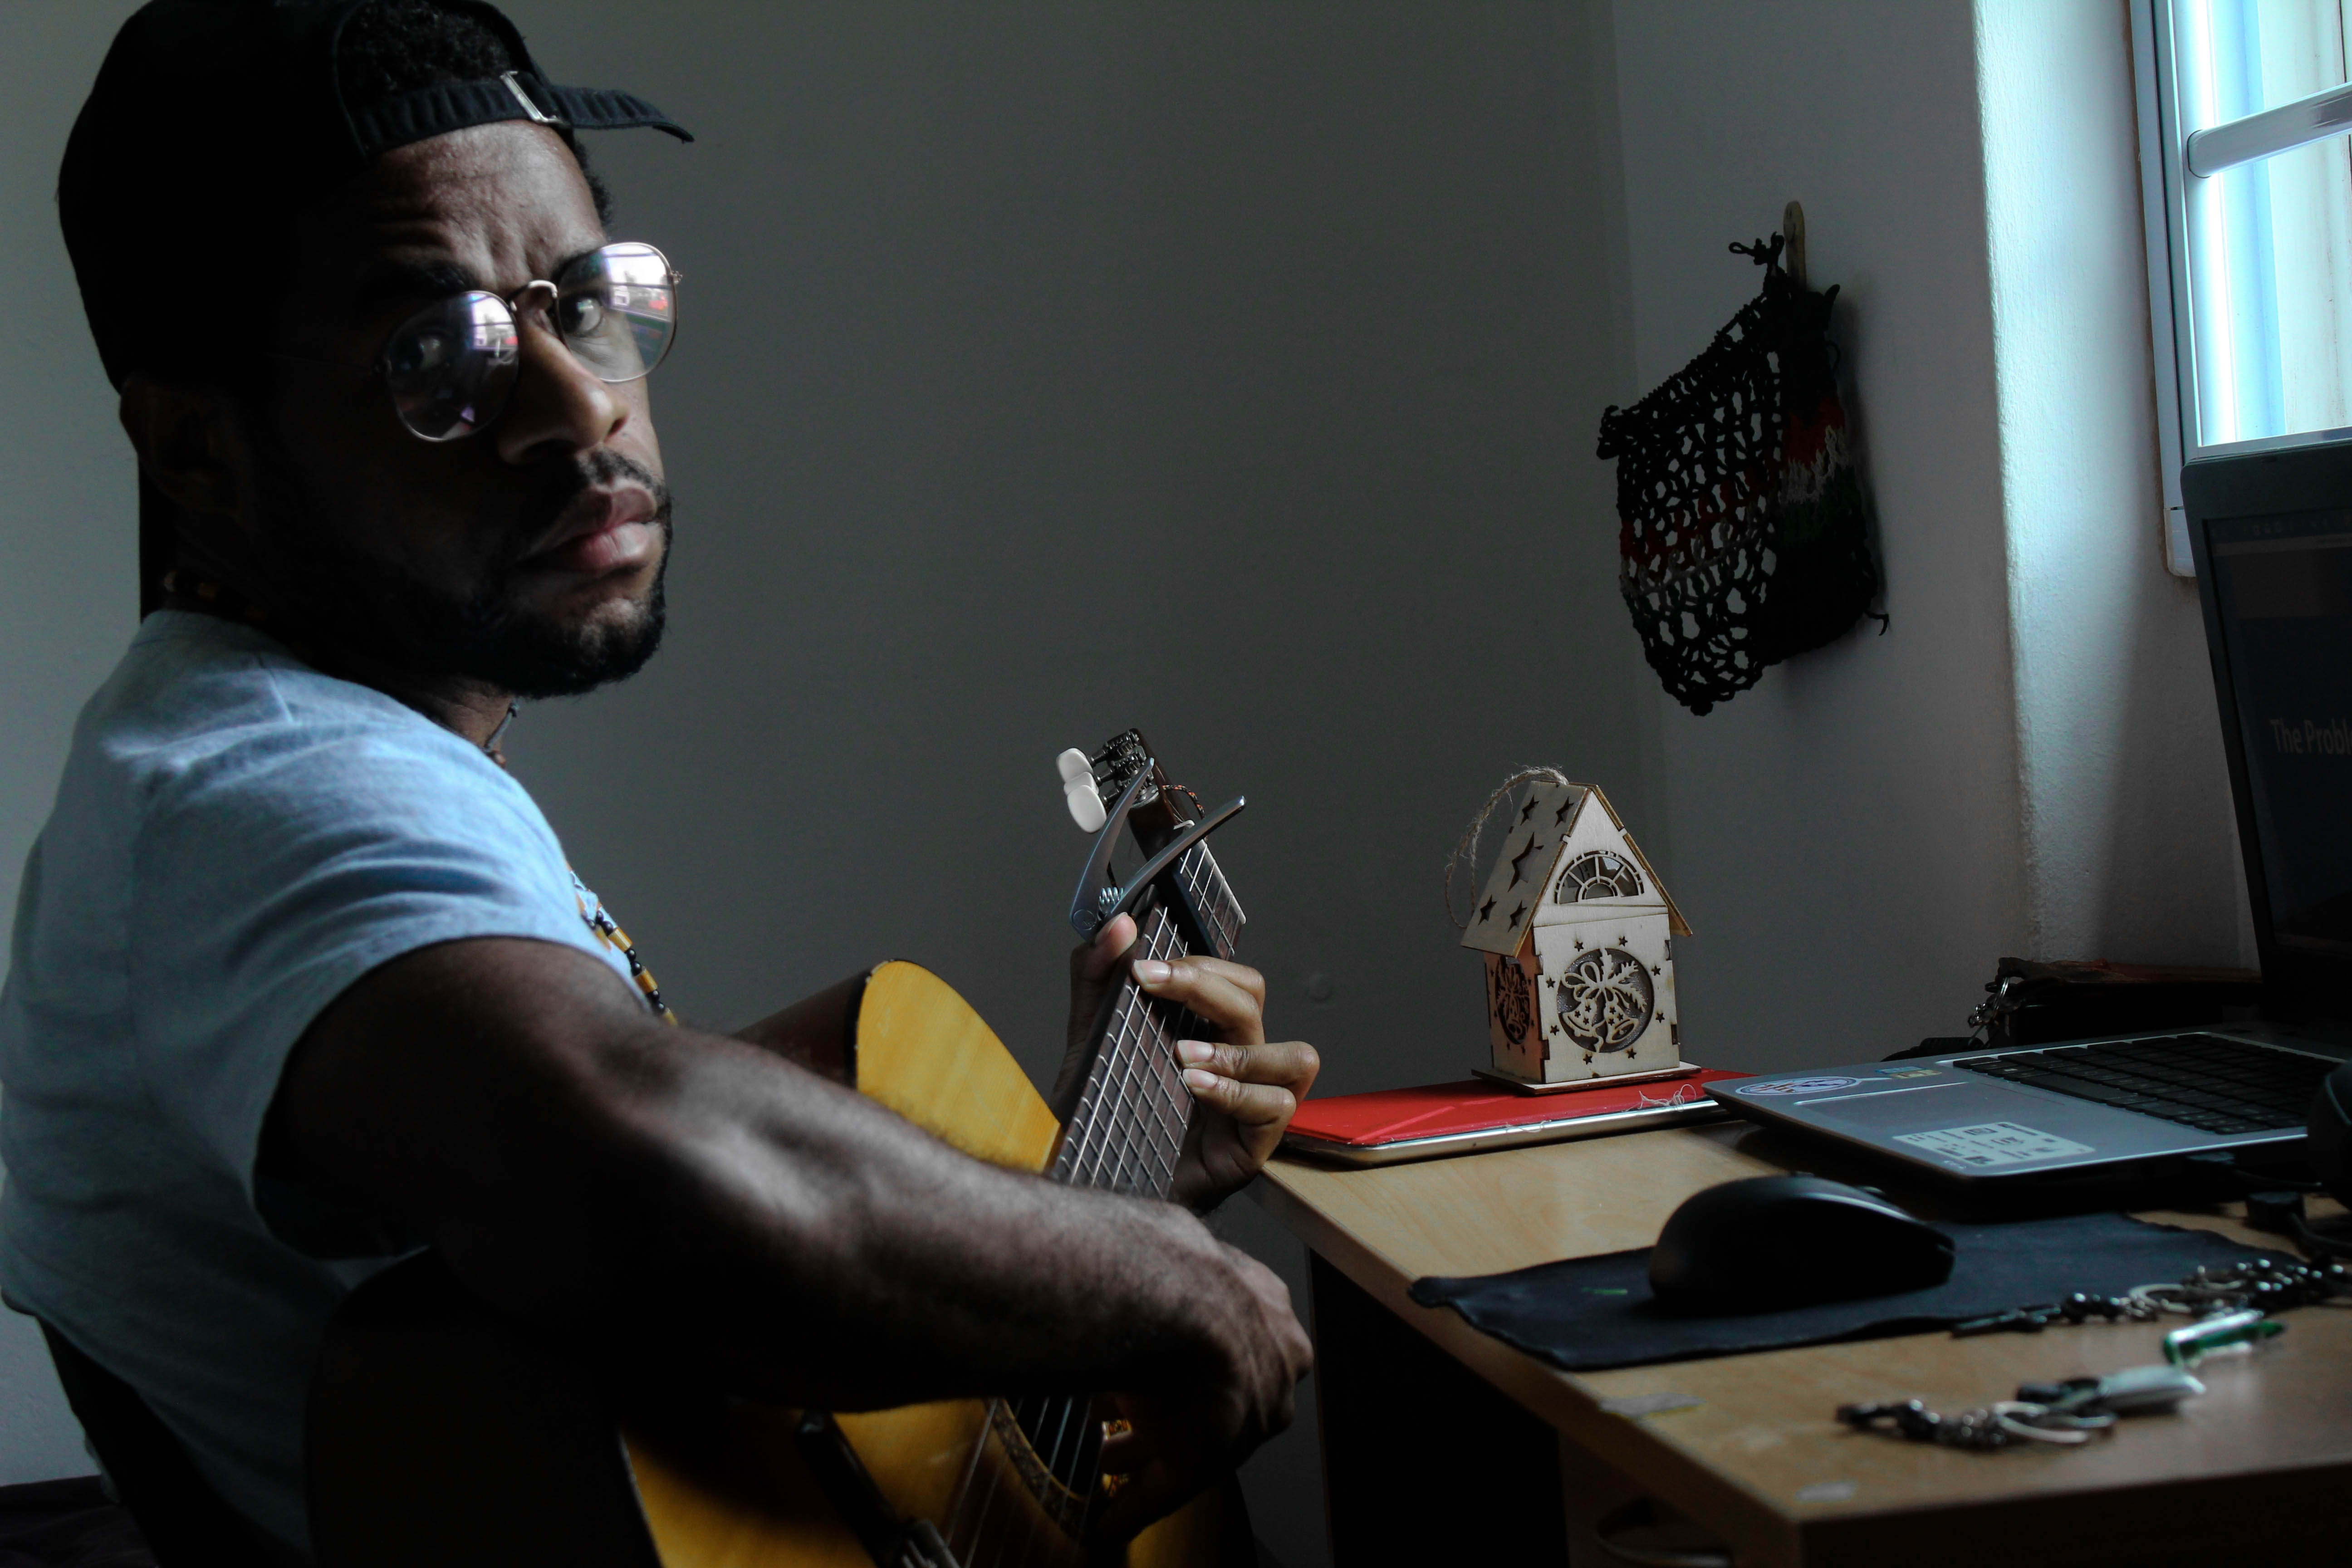 man playing guitar beside table